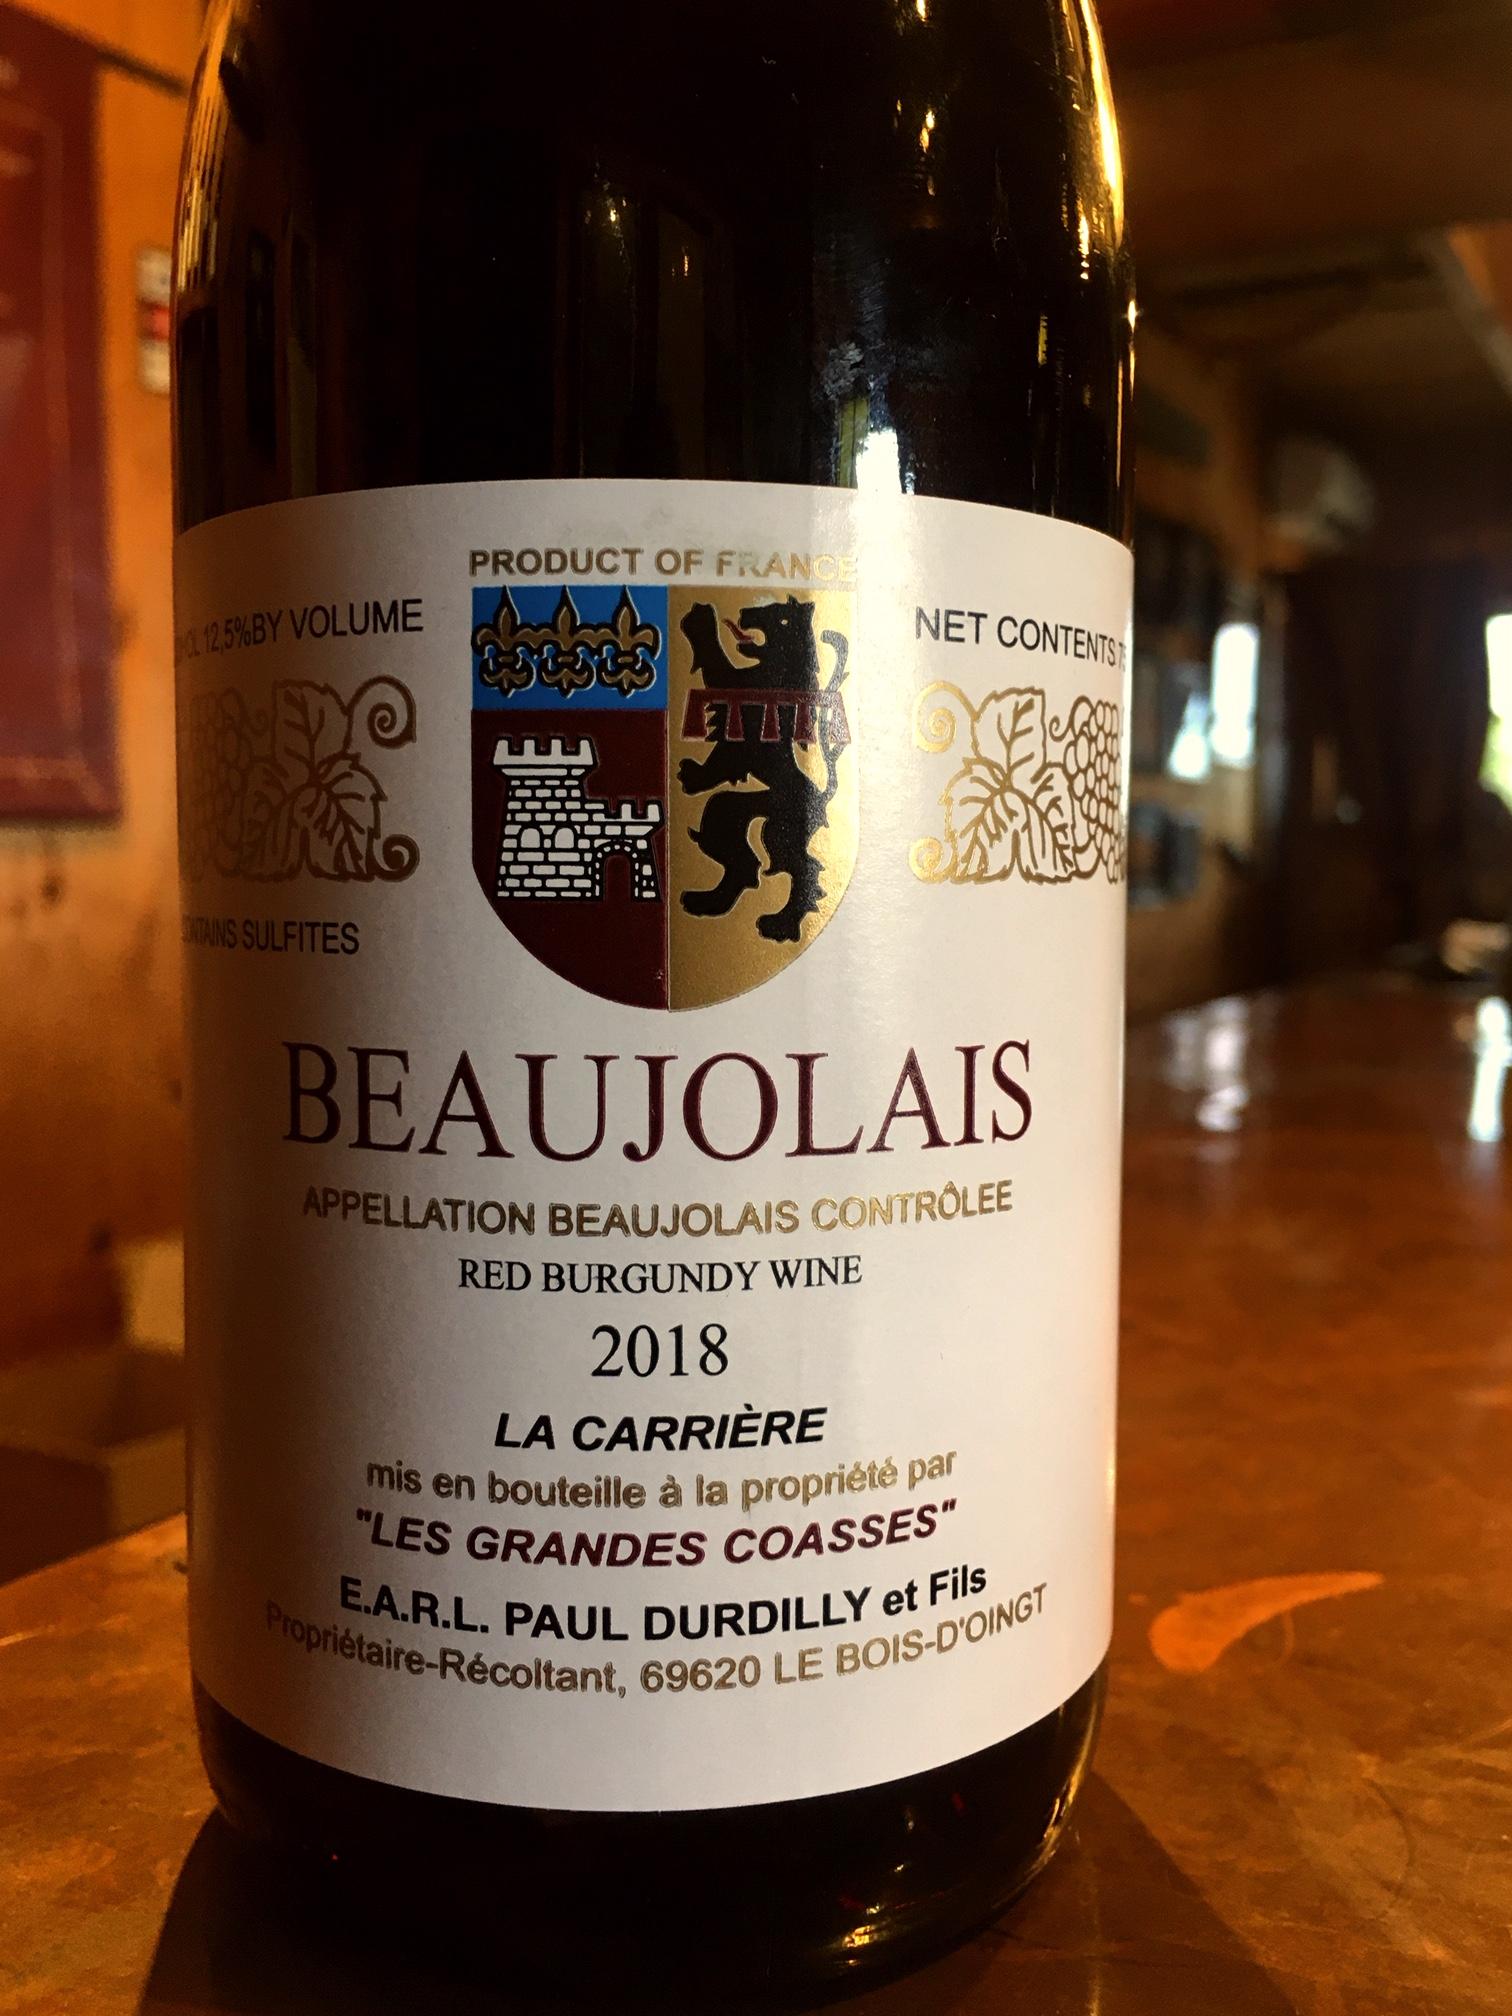 2018 Beaujolais, Les Grandes Coasses